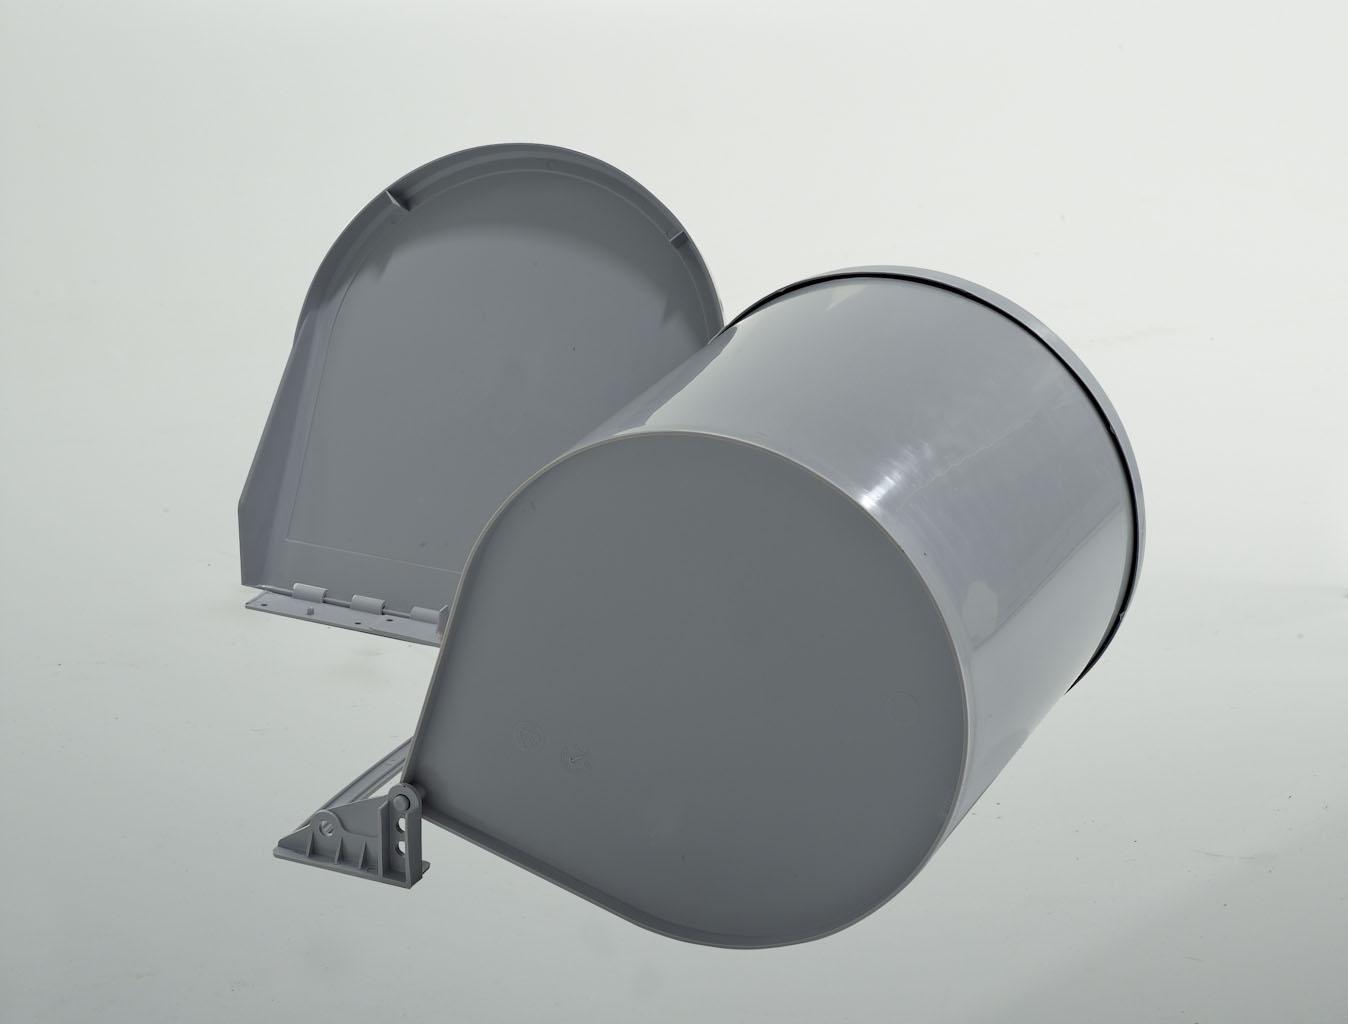 Ведро для мусора RING 10л автомат. открывание (265x320мм), пластик